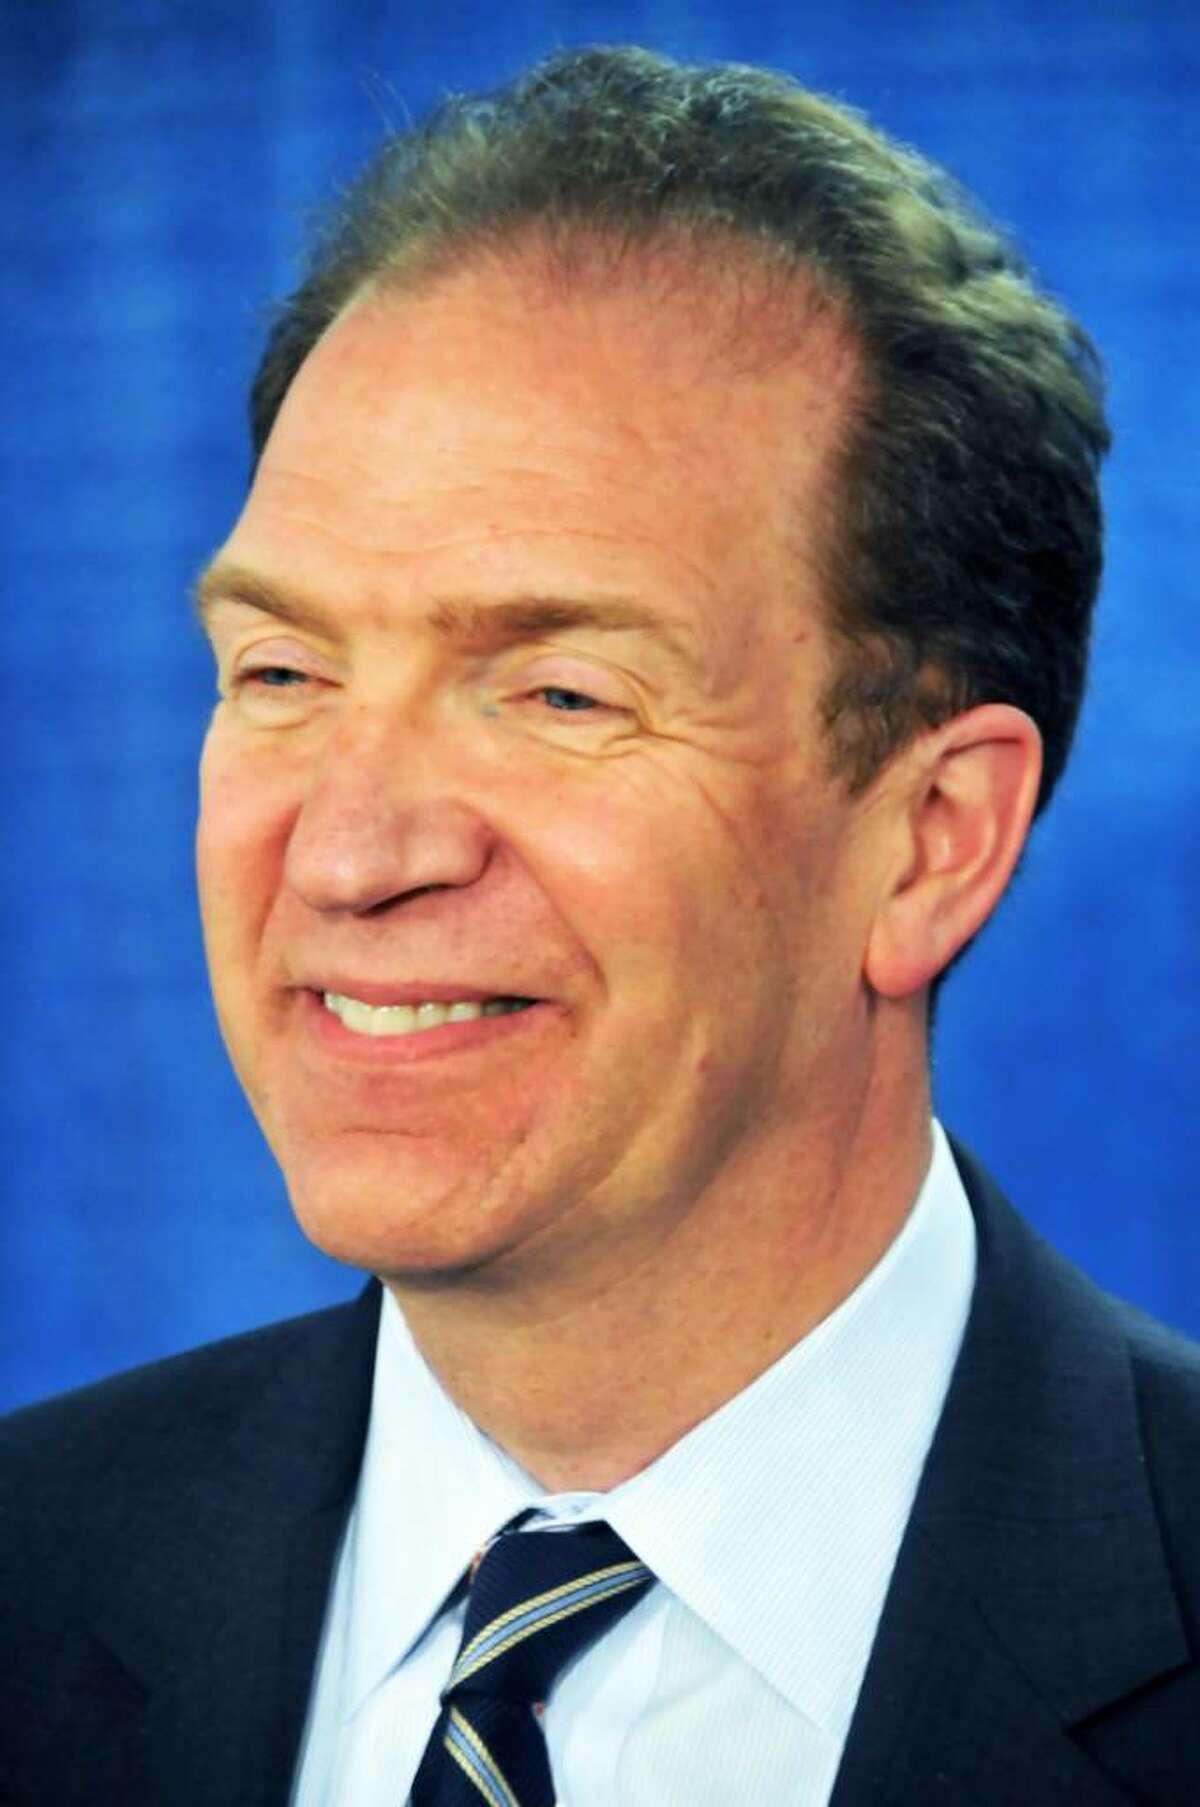 David Malpass, economist who ran for U.S. Senate in 2010. (John Carl D'Annibale / Times Union)